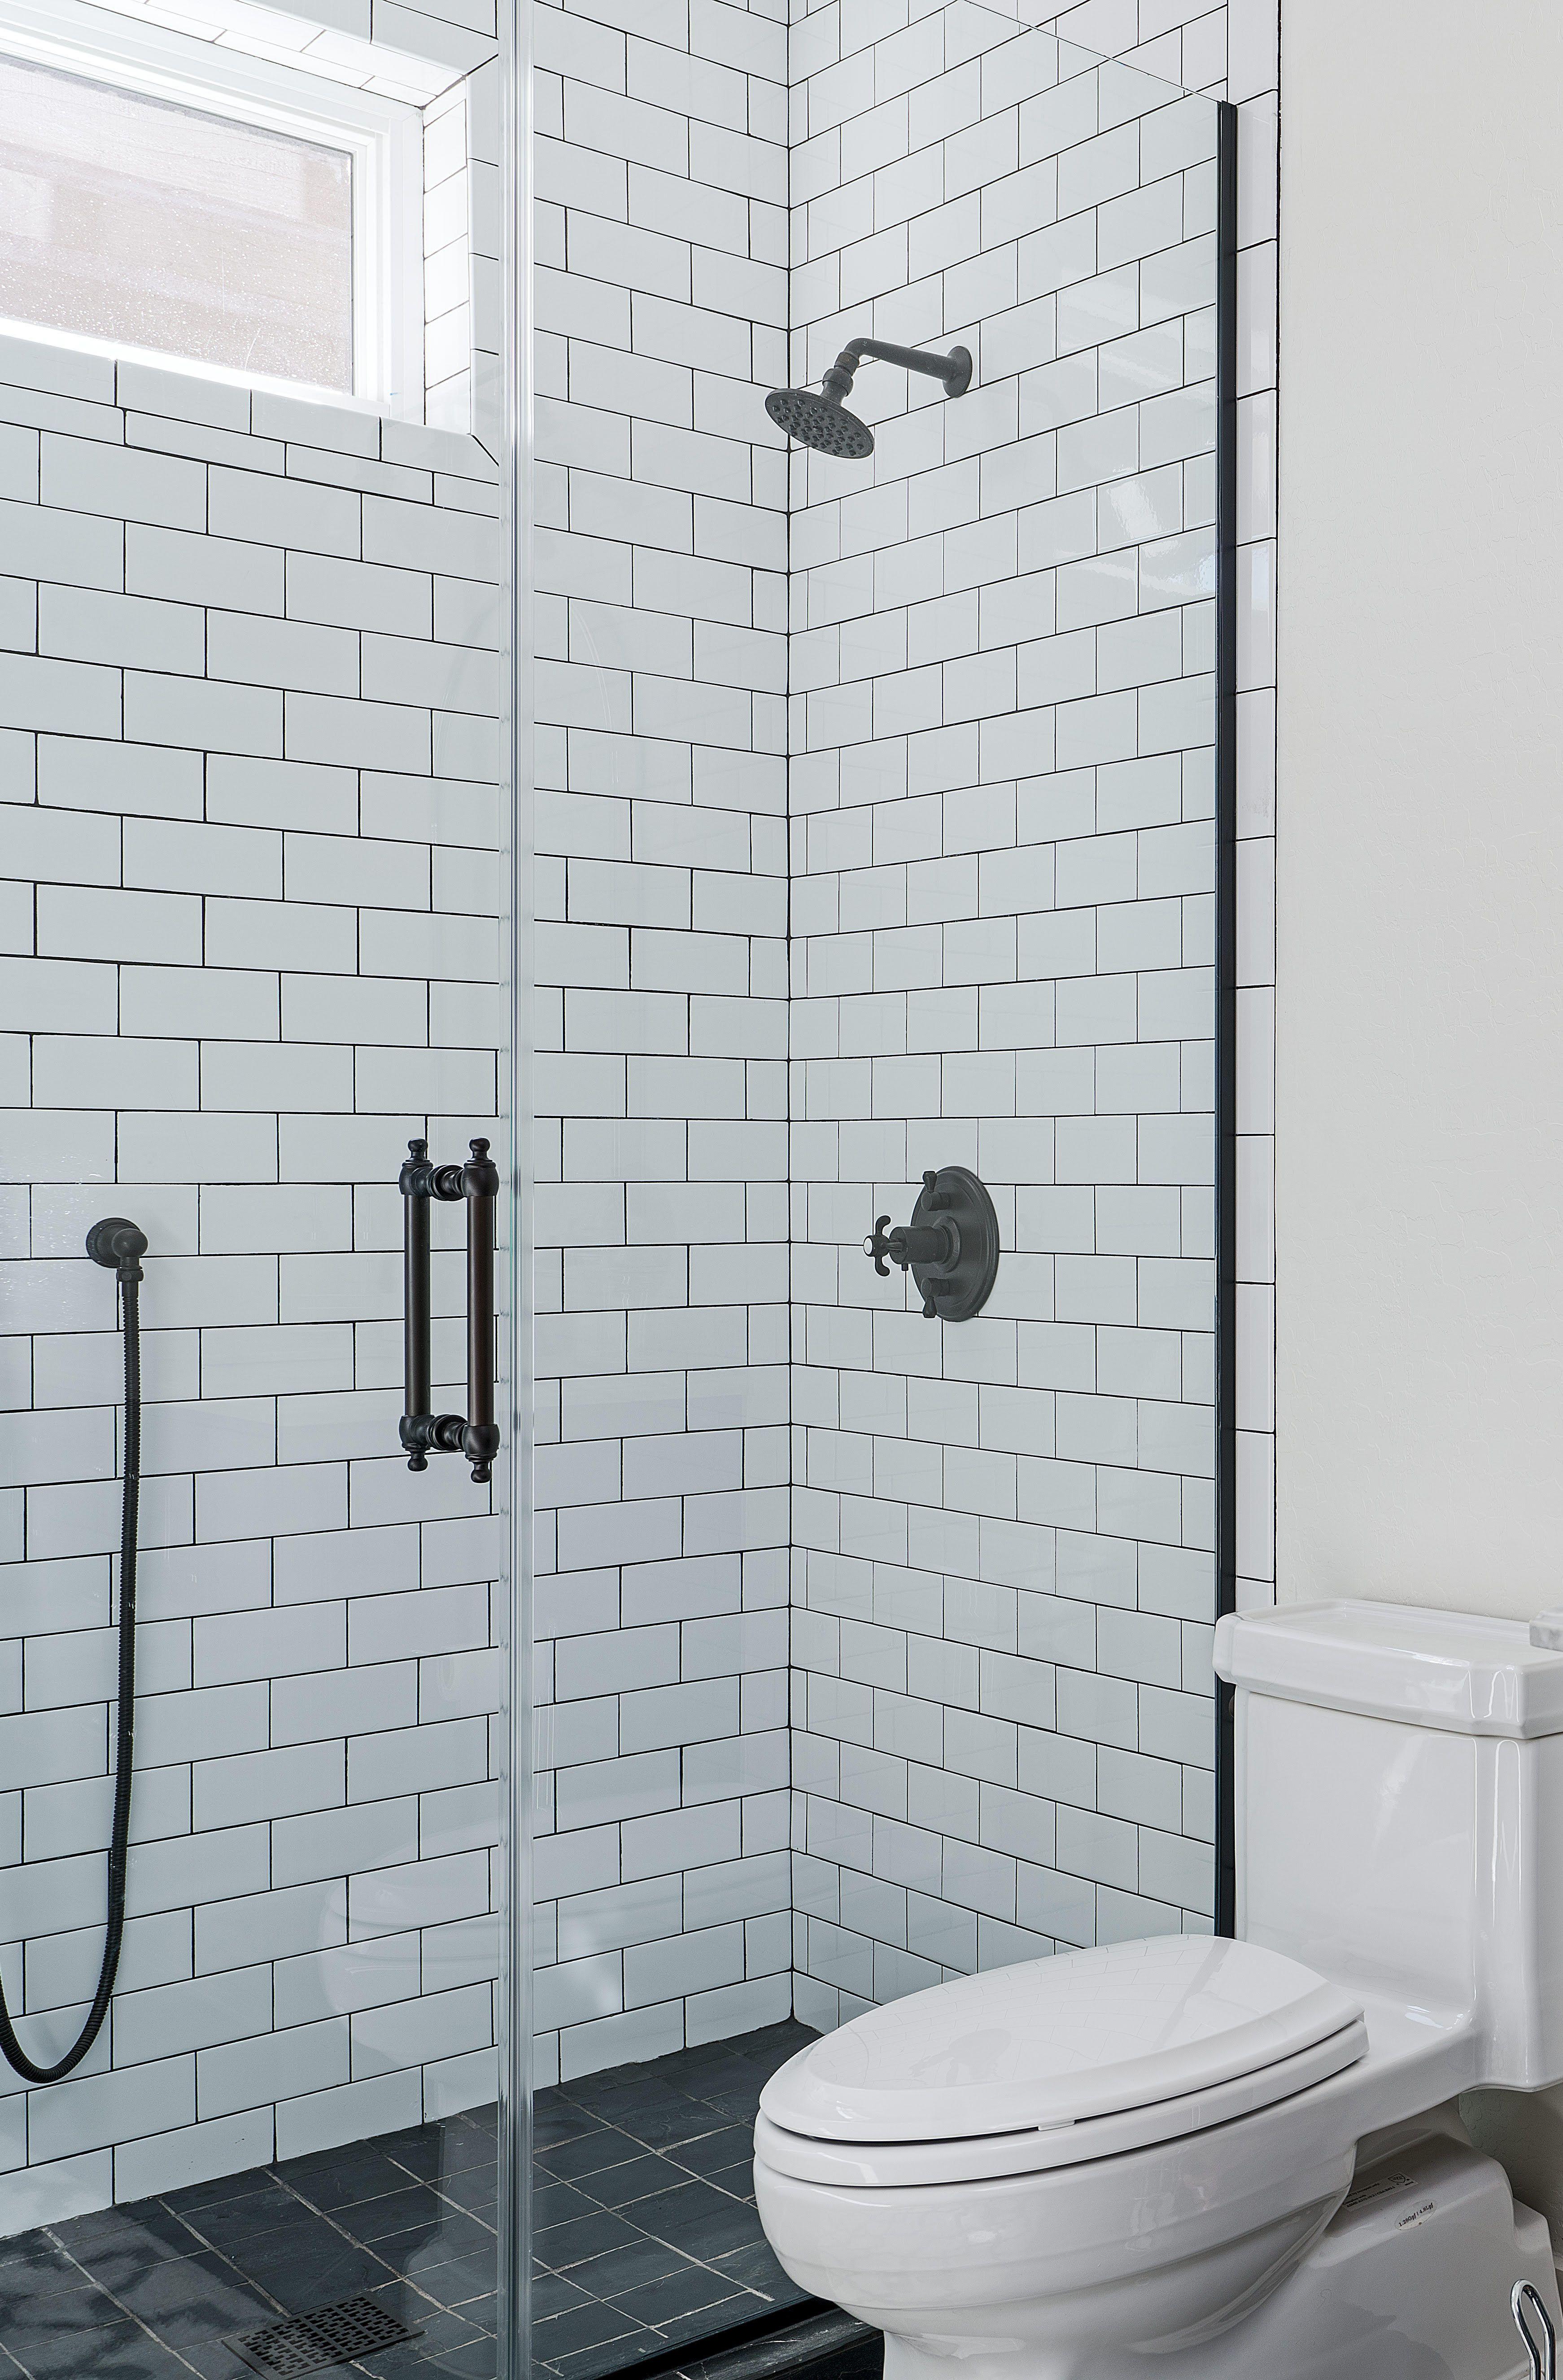 How To Make A Small Bathroom Look Bigger Small Bathroom Frameless Shower Doors Big Bathrooms